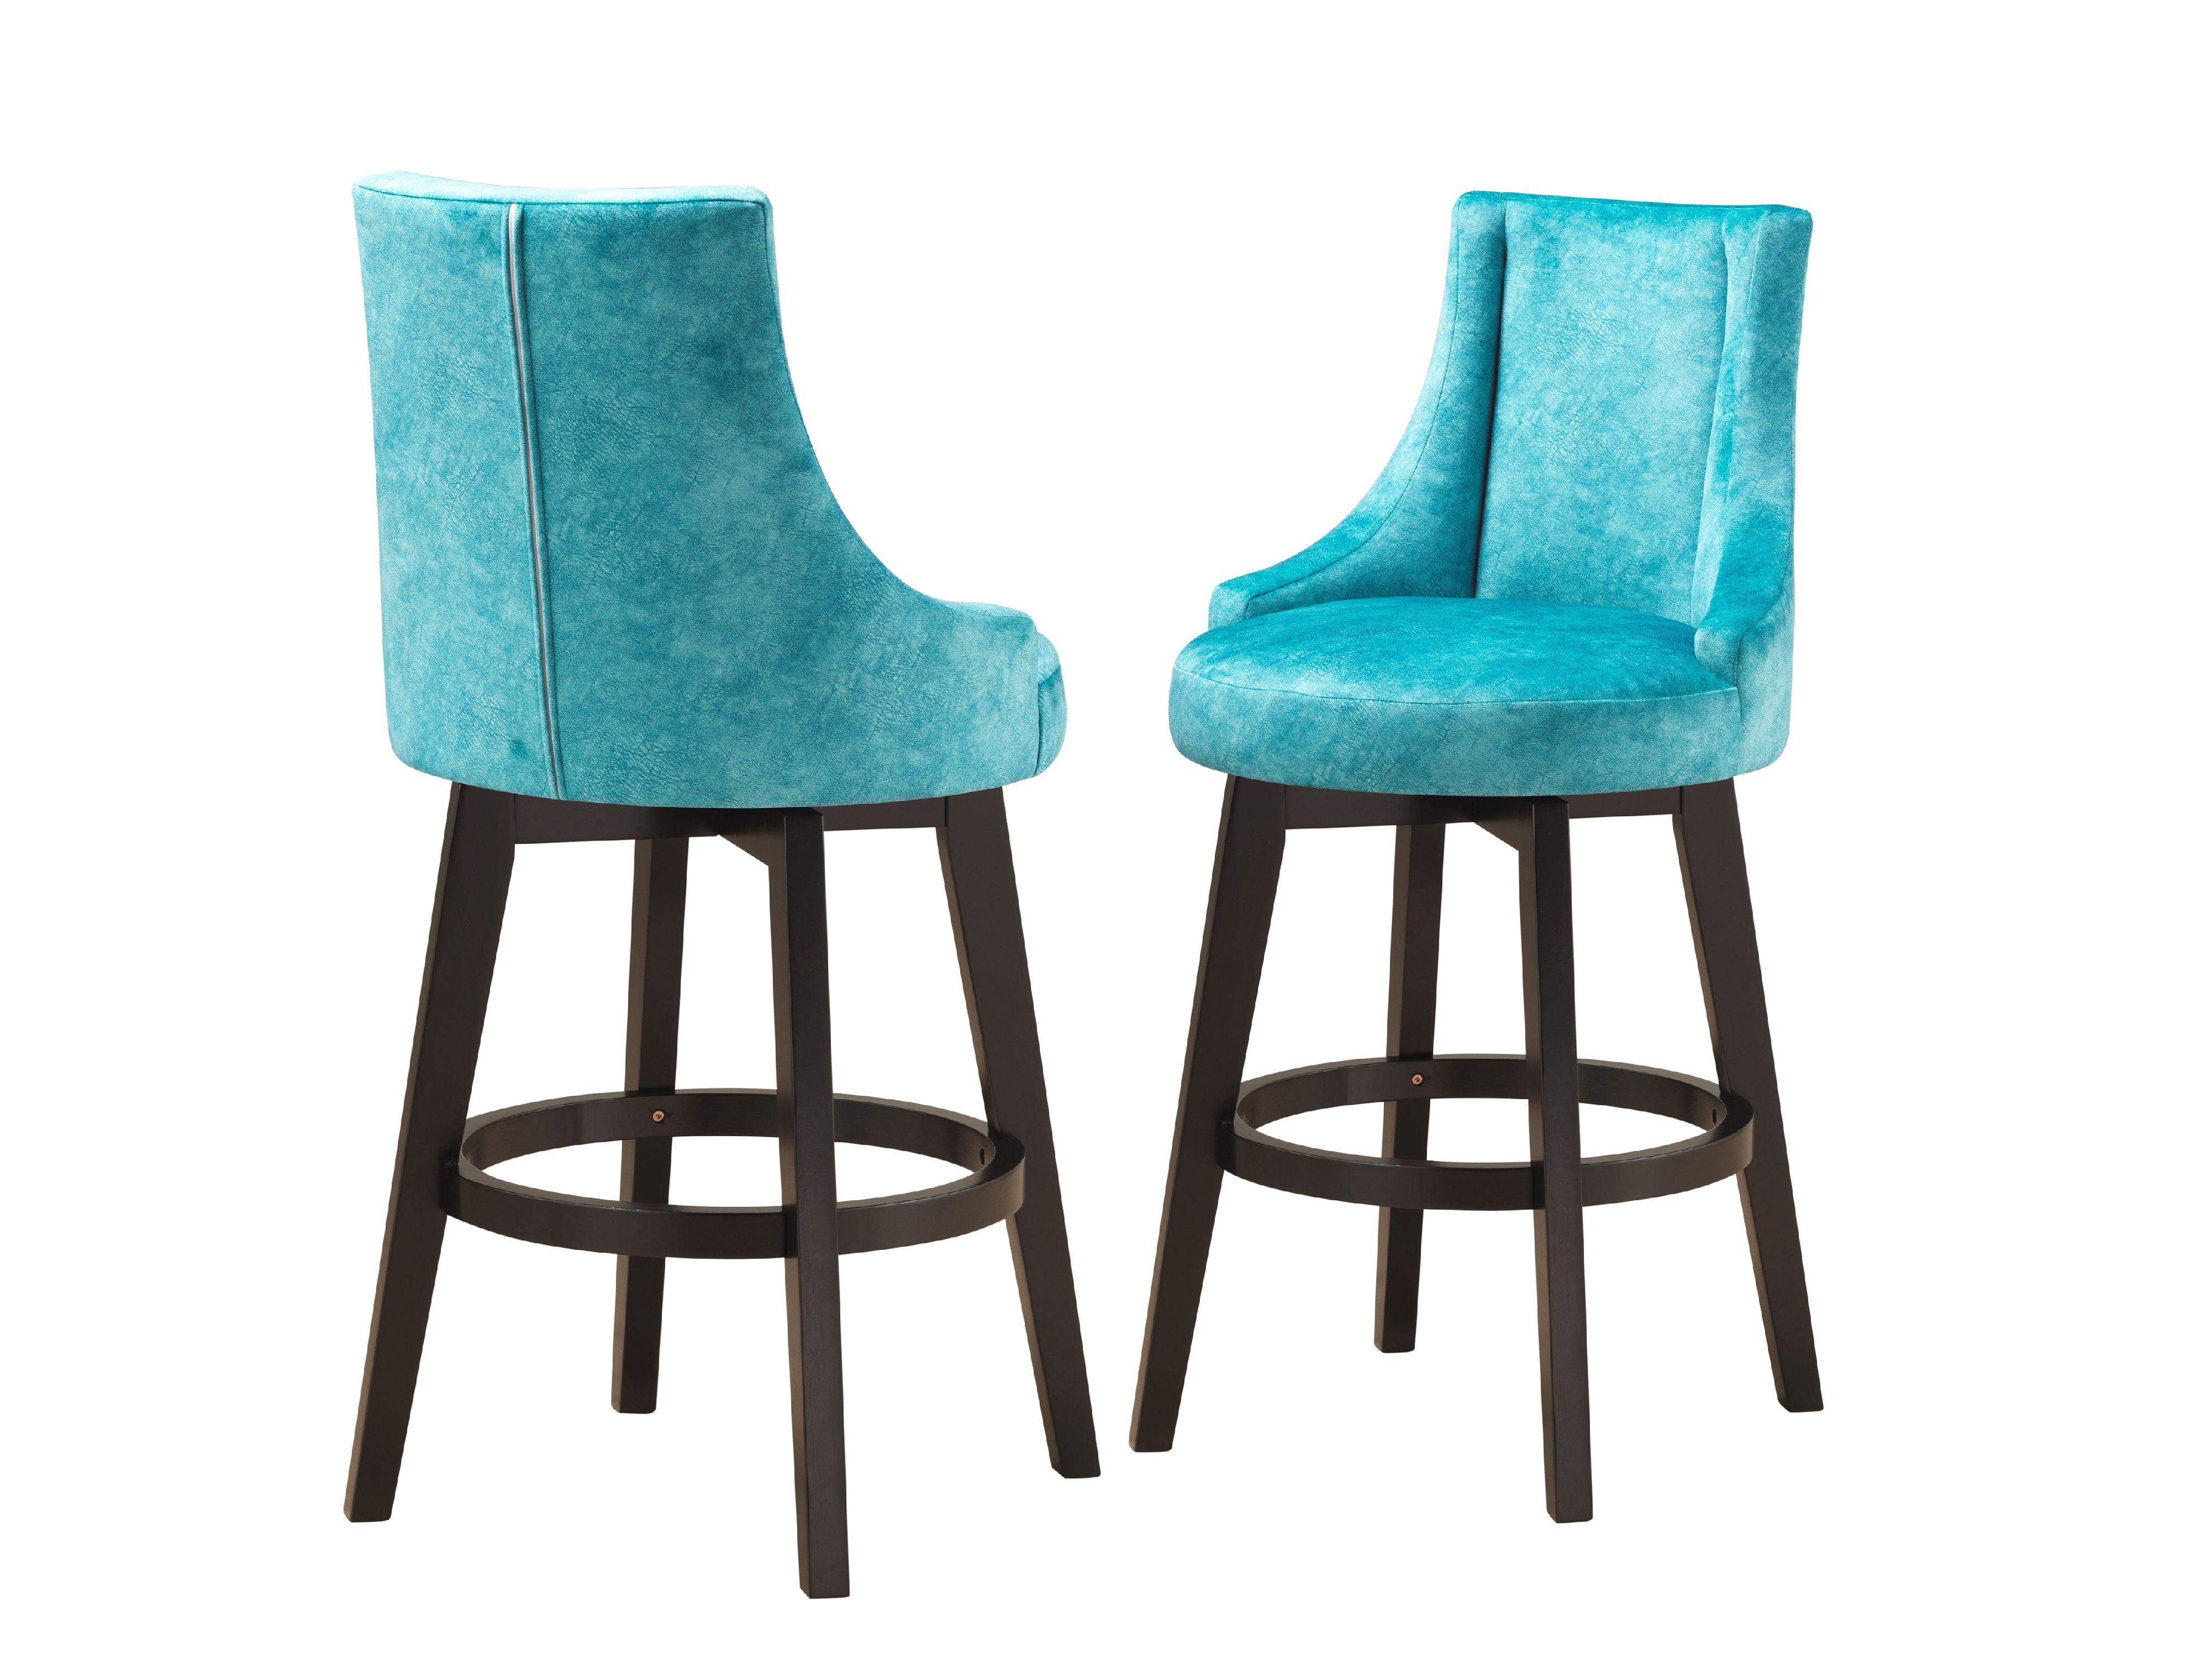 Picture of: Walden 30 H Swivel Bar Stools Upholstered Light Blue Fabric Cappuccino Wood Legs Set Of 2 Walmart Com Walmart Com